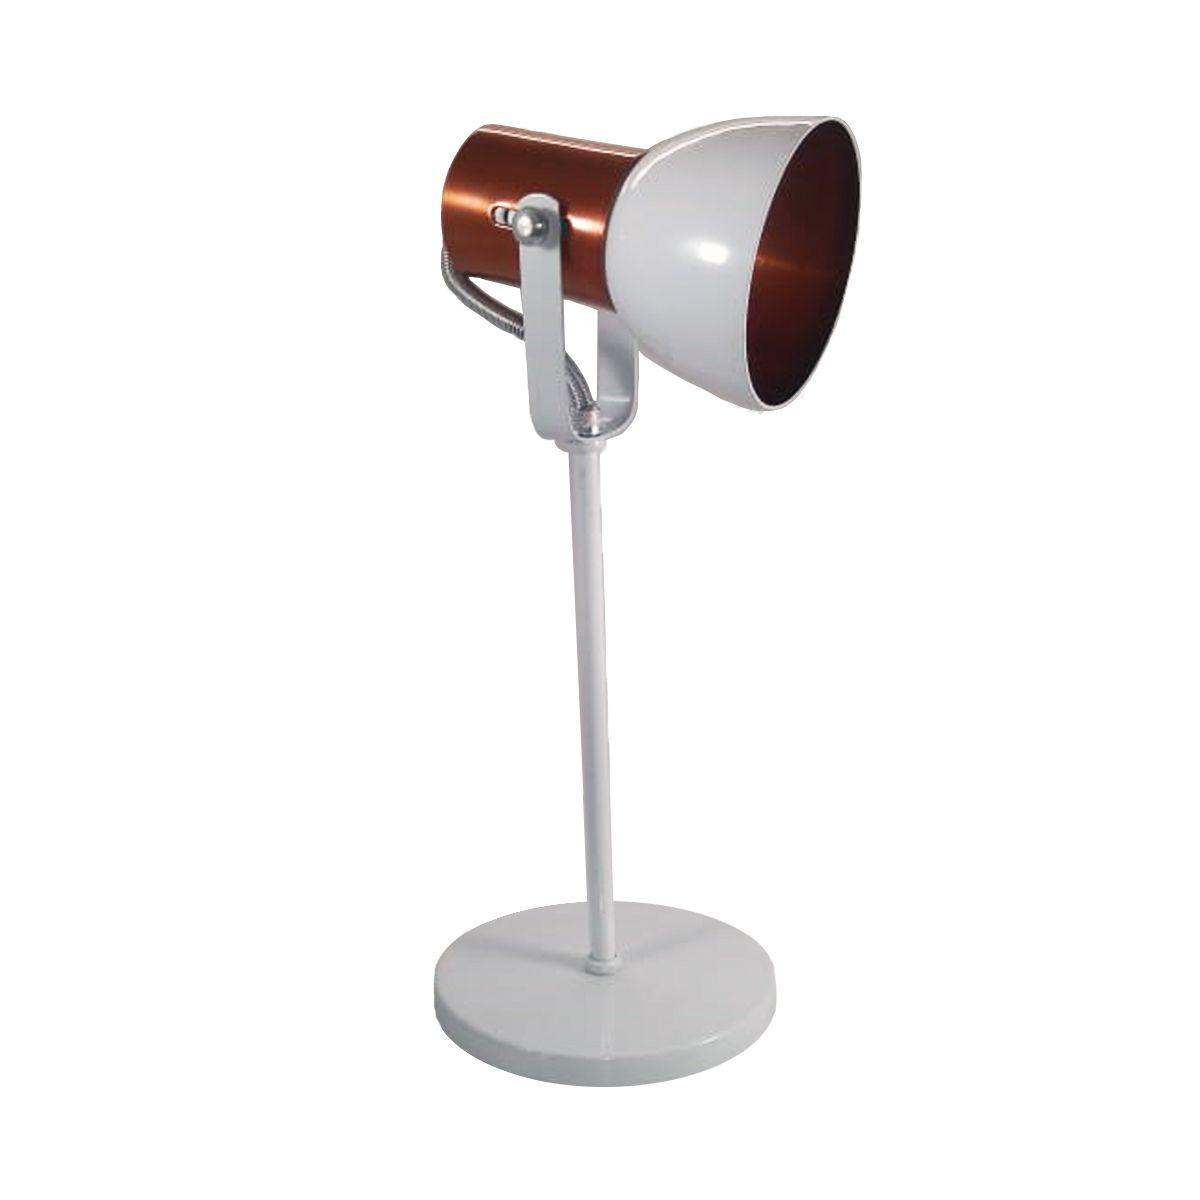 Luminária de Mesa Abajur Branco/Cobre 1E27 LM110/BC-CO Kin Light